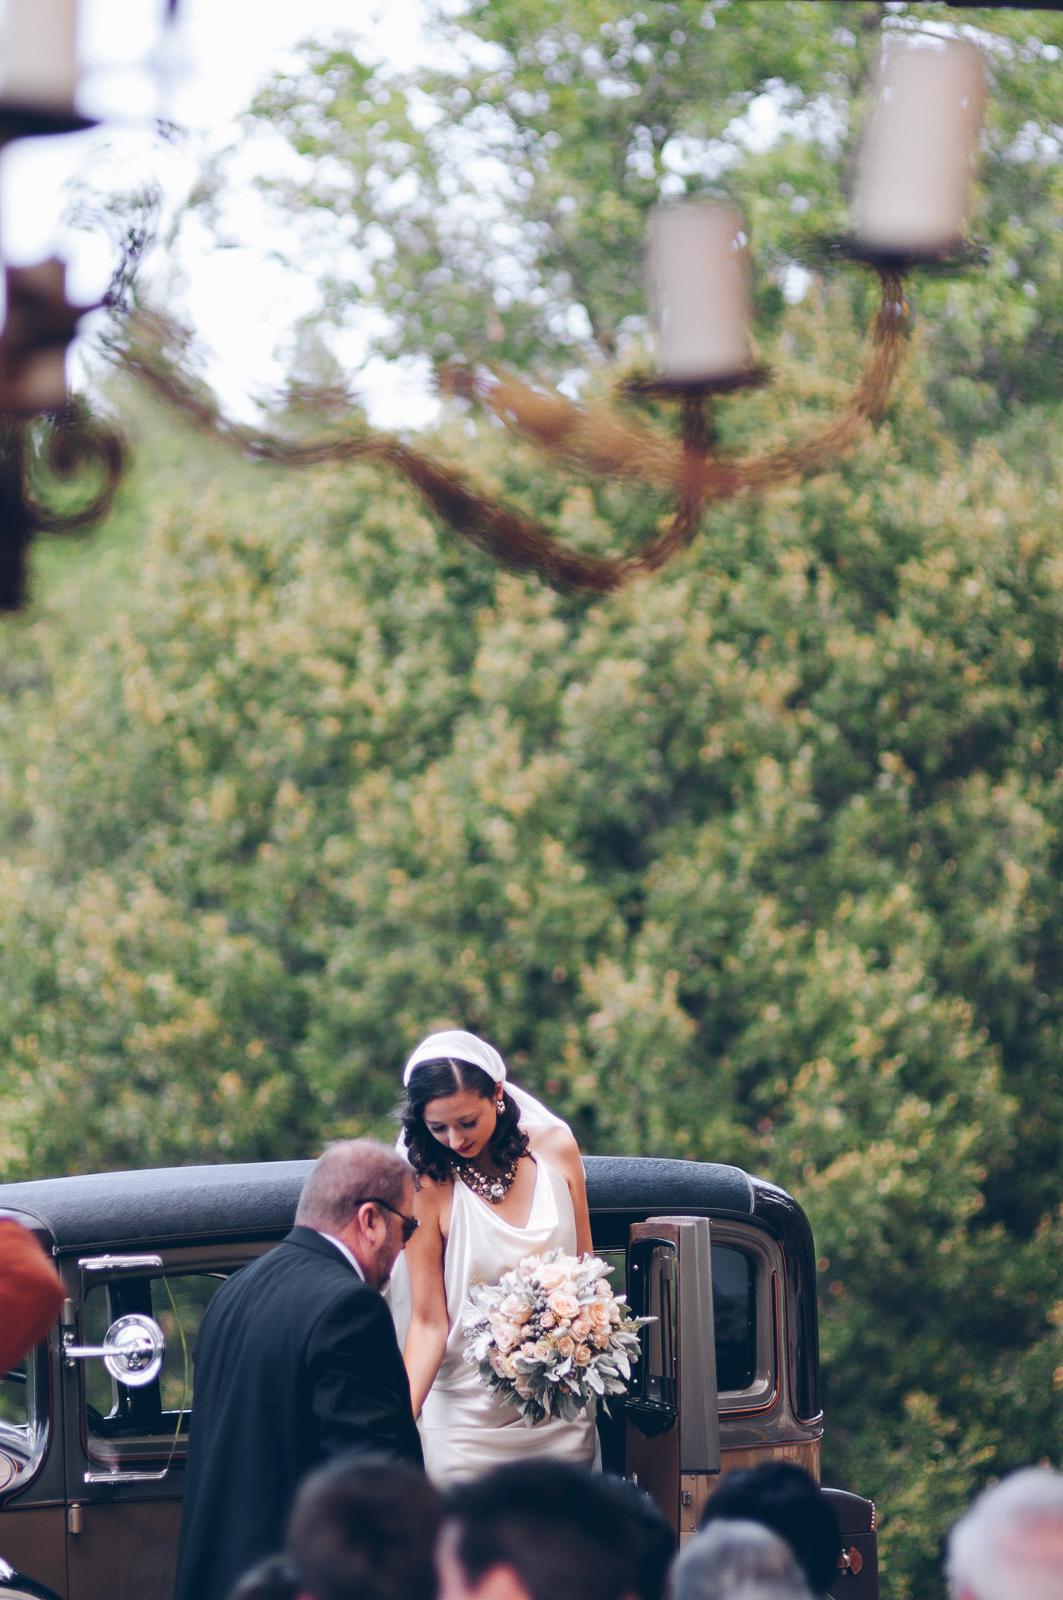 miraflores_winery_wedding_photography_ian_melissa_ebony_siovhan_bokeh_photography_22.jpg